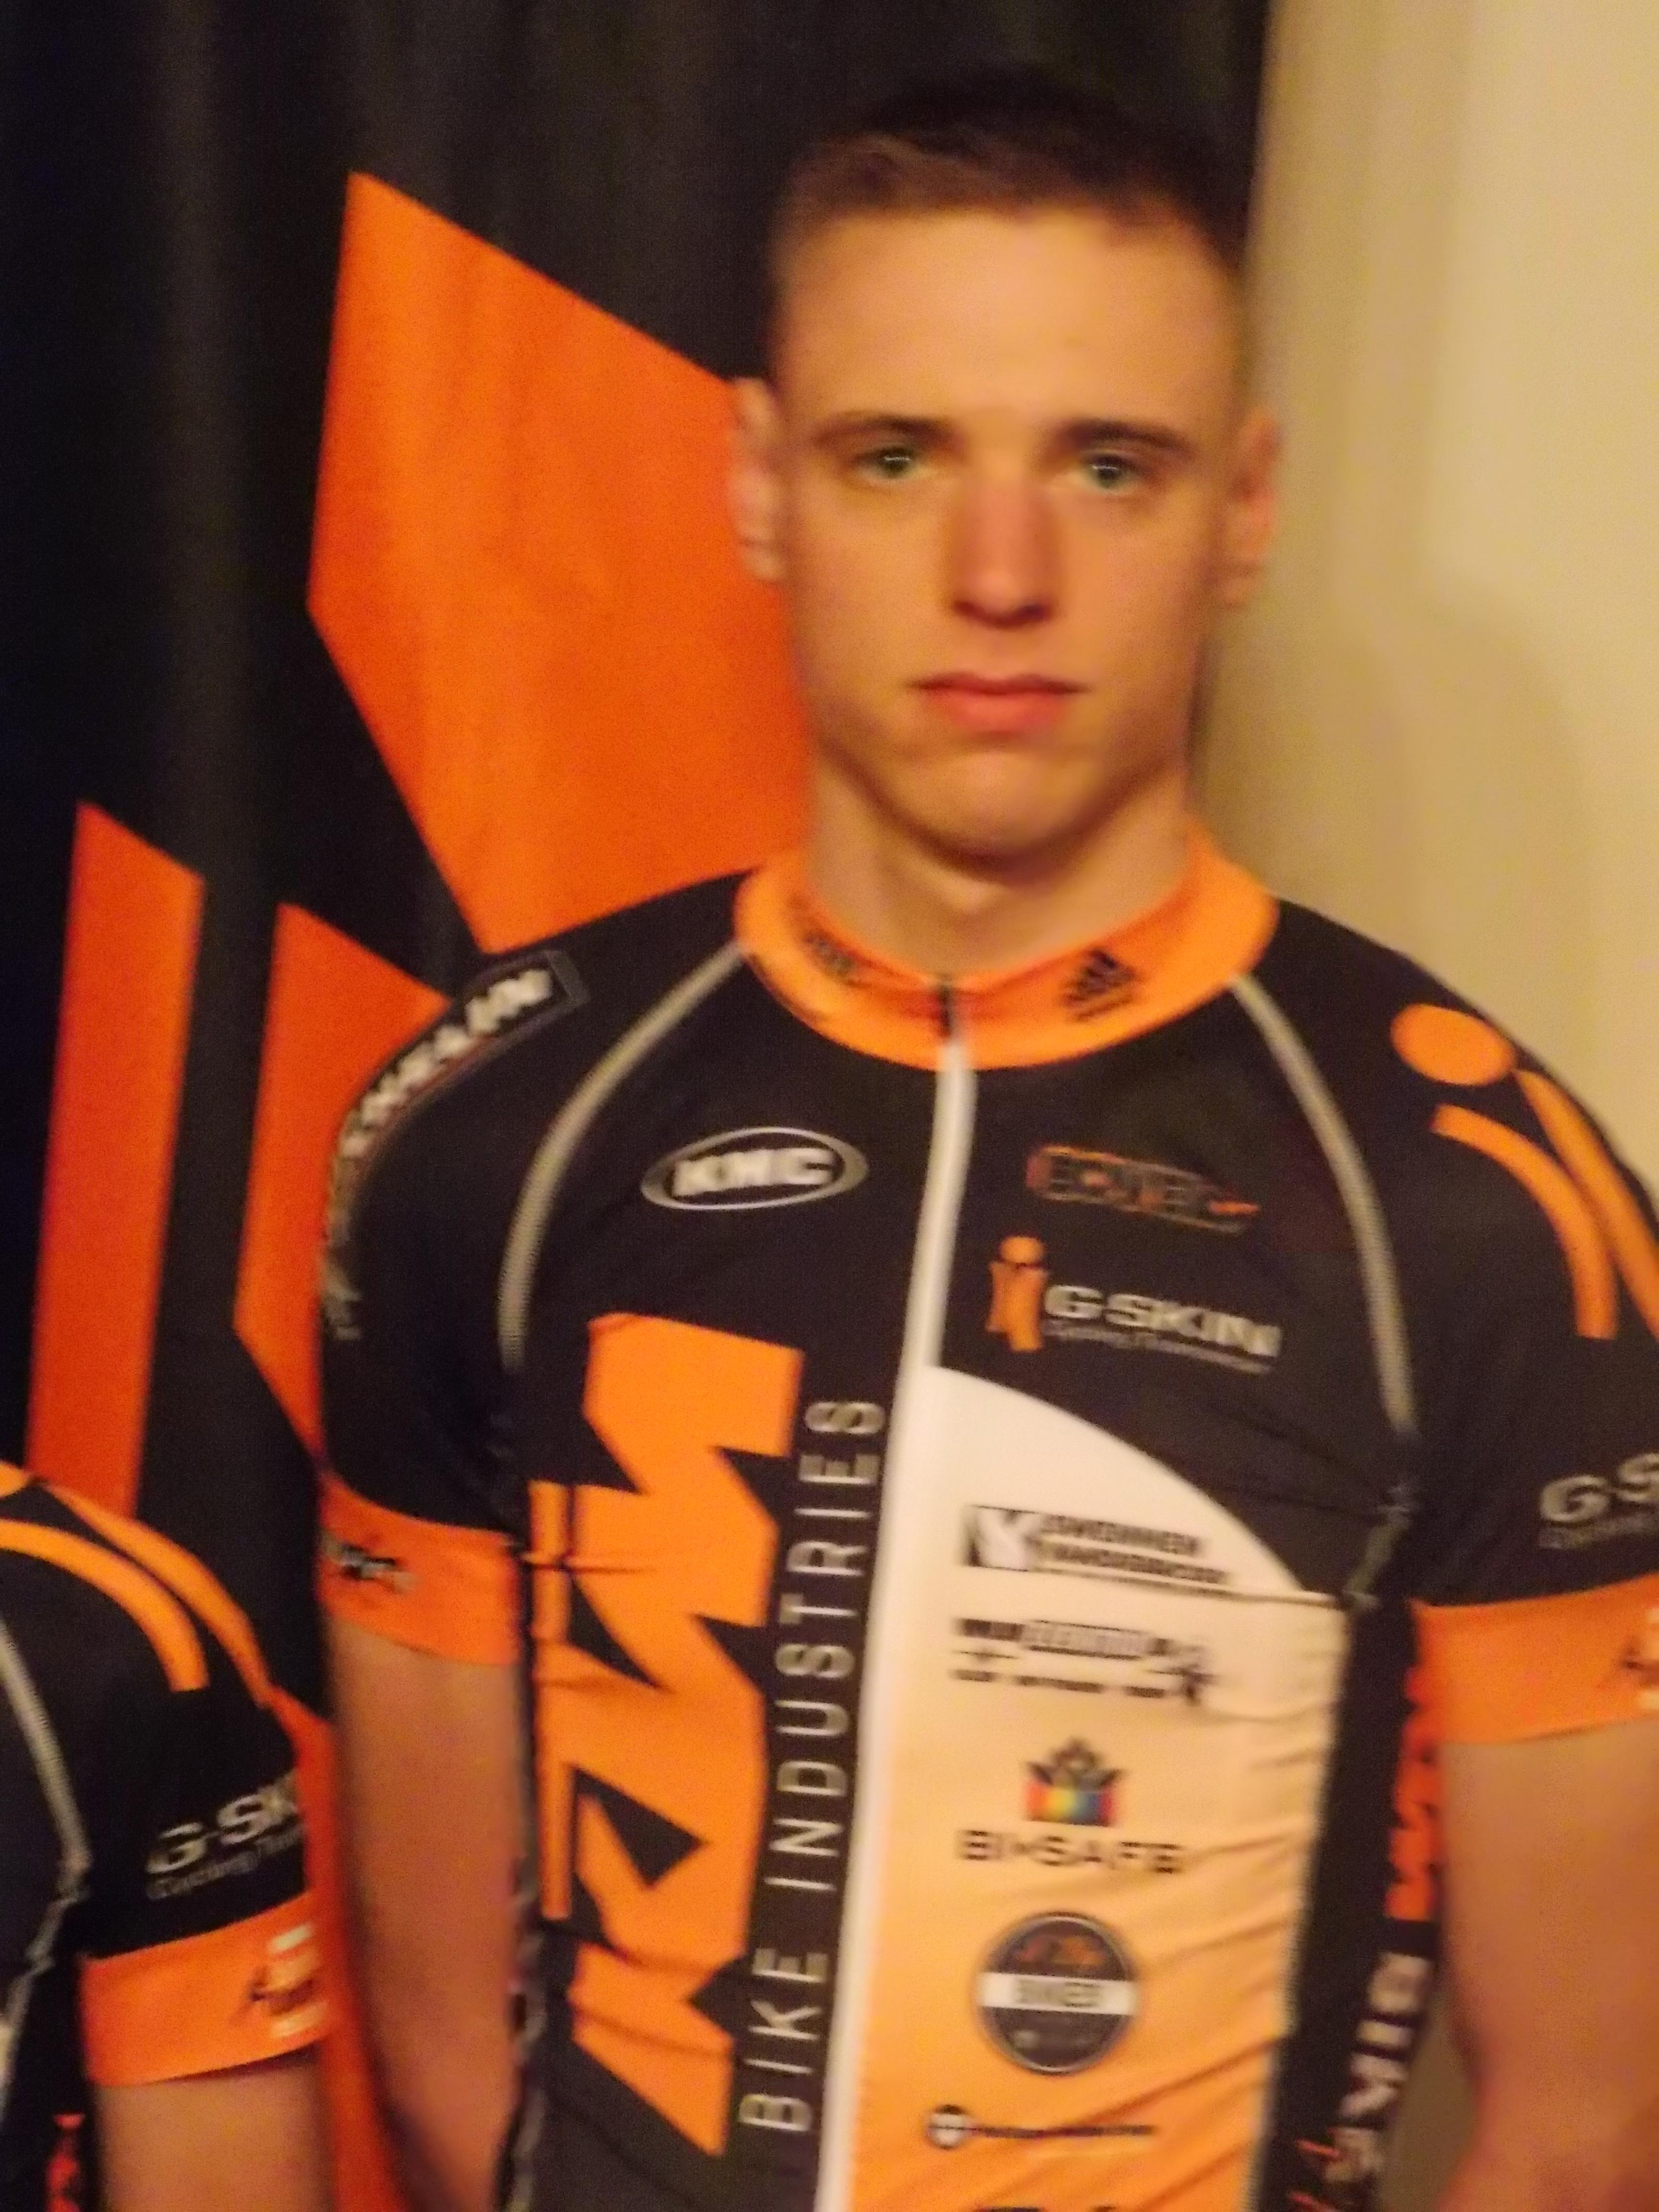 Samuel Gaze wereldkampioen U23, Kevin Panhuyzen tiende in Nove Mesto